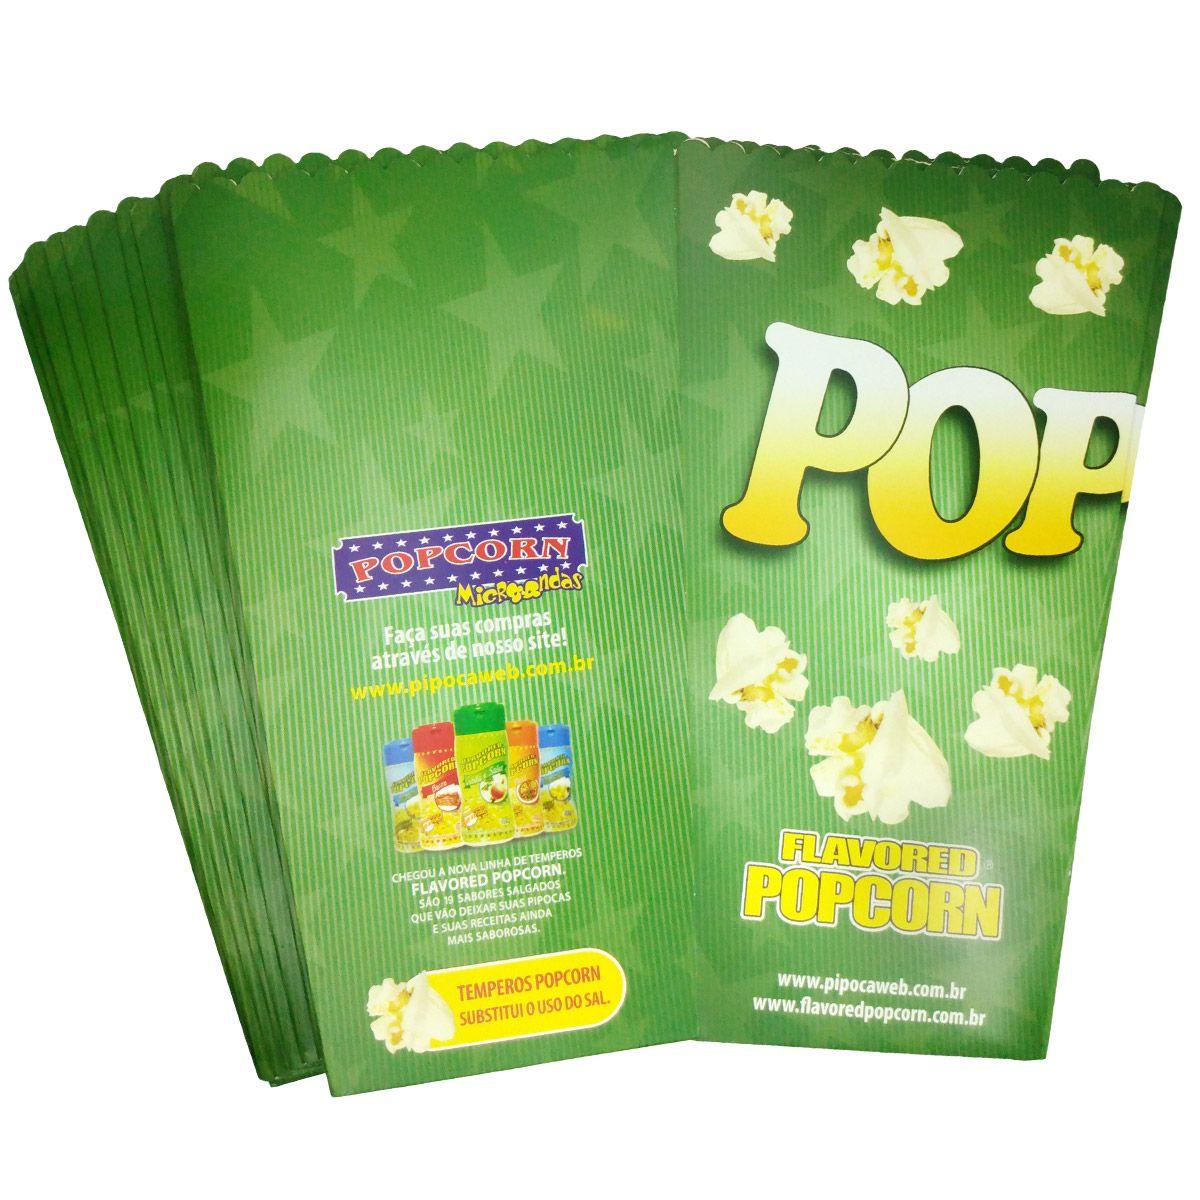 Embalagem Cinema Popcorn BOX MEGA (Tamanho família)